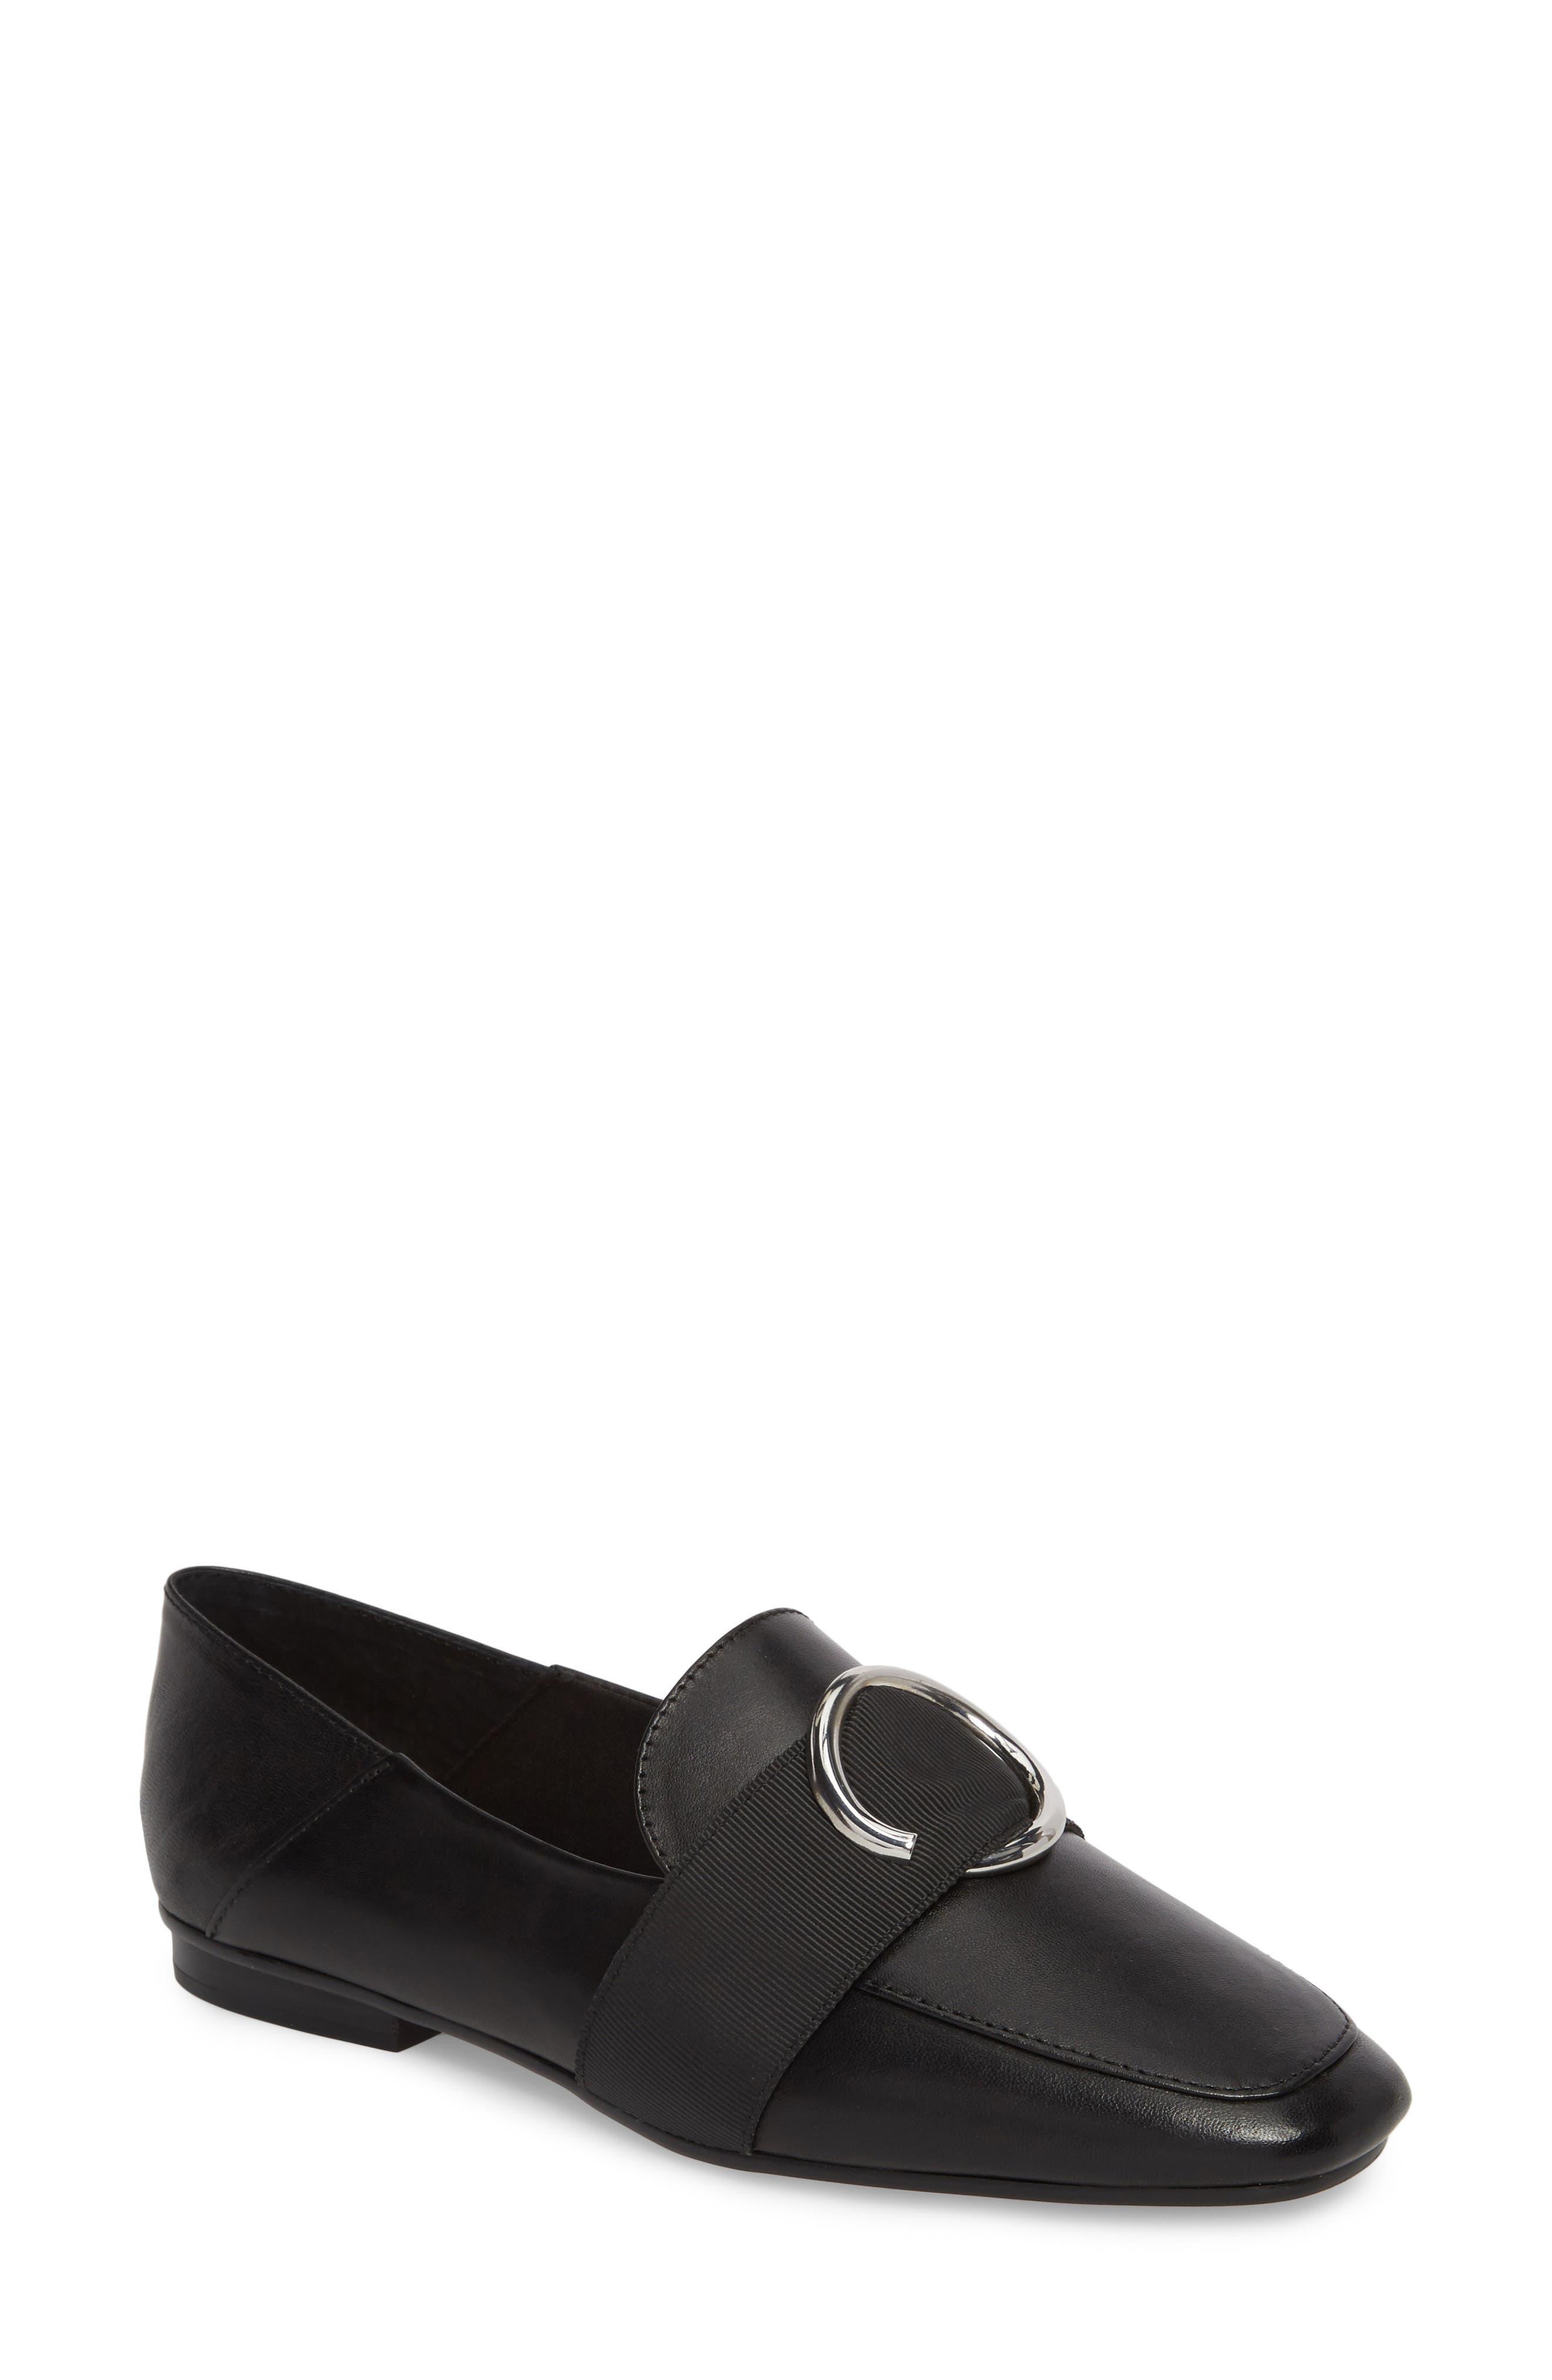 Ilani Convertible Slip Ring Loafer,                         Main,                         color, 001